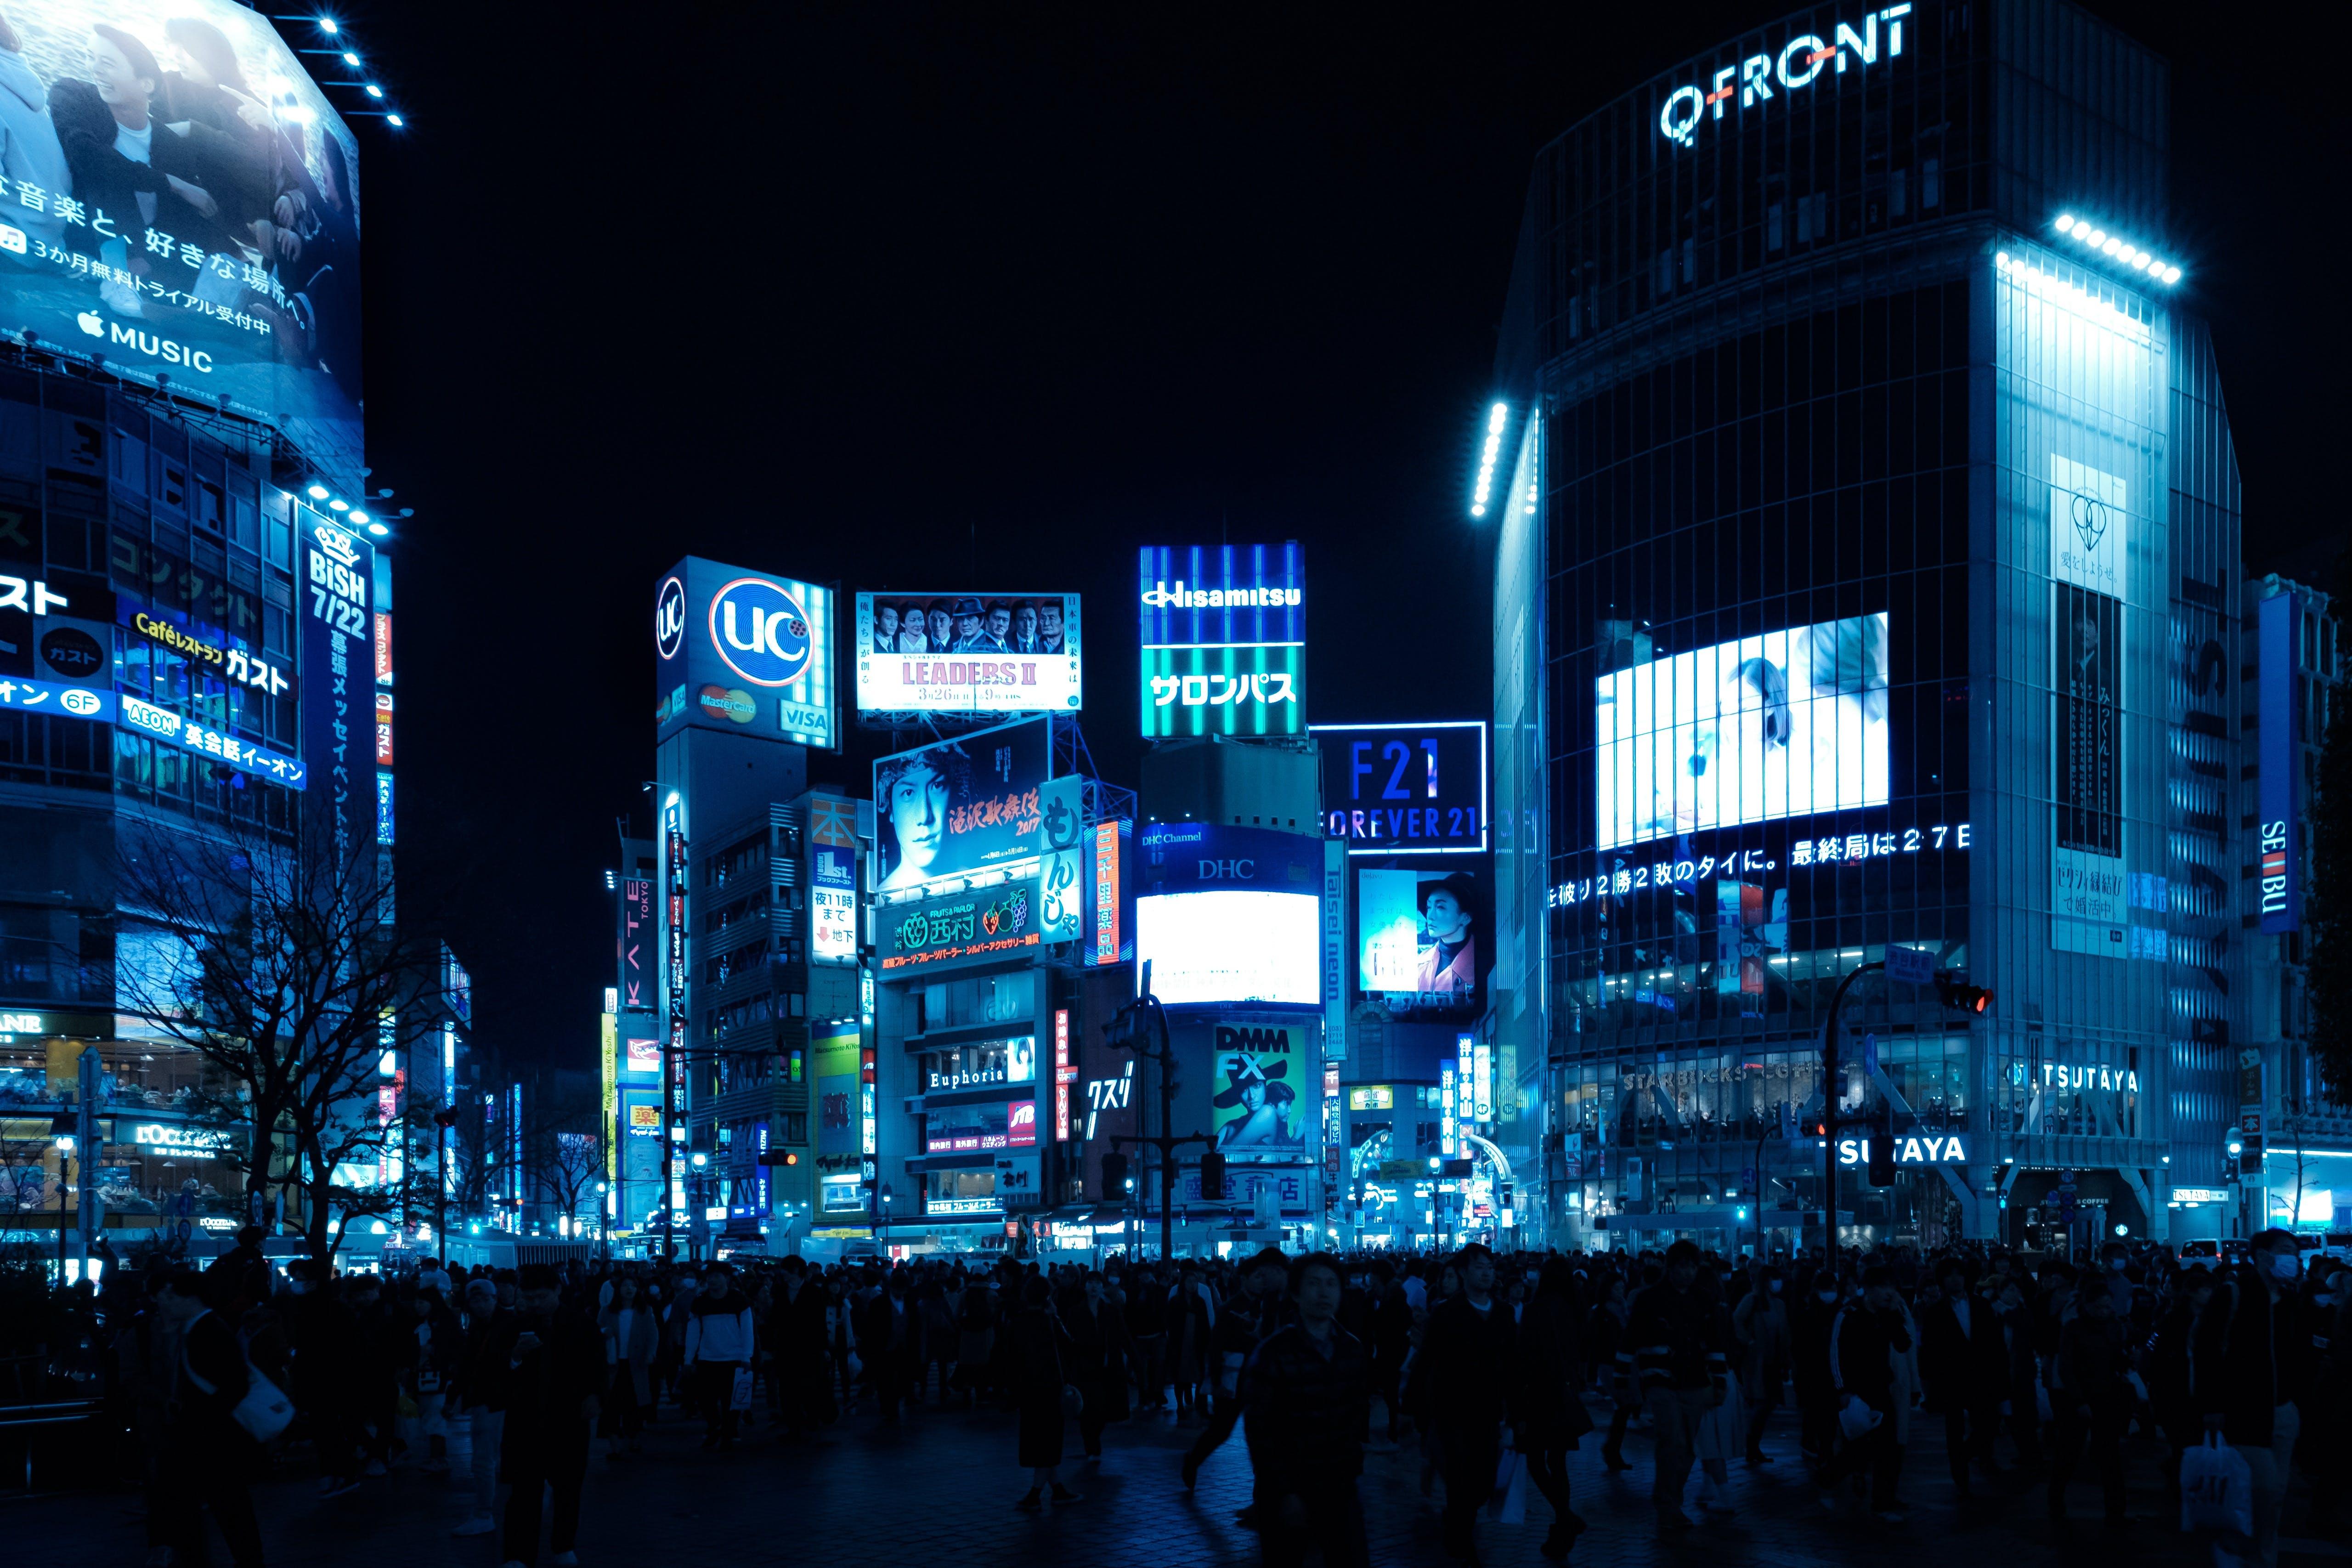 architecture, billboards, blue